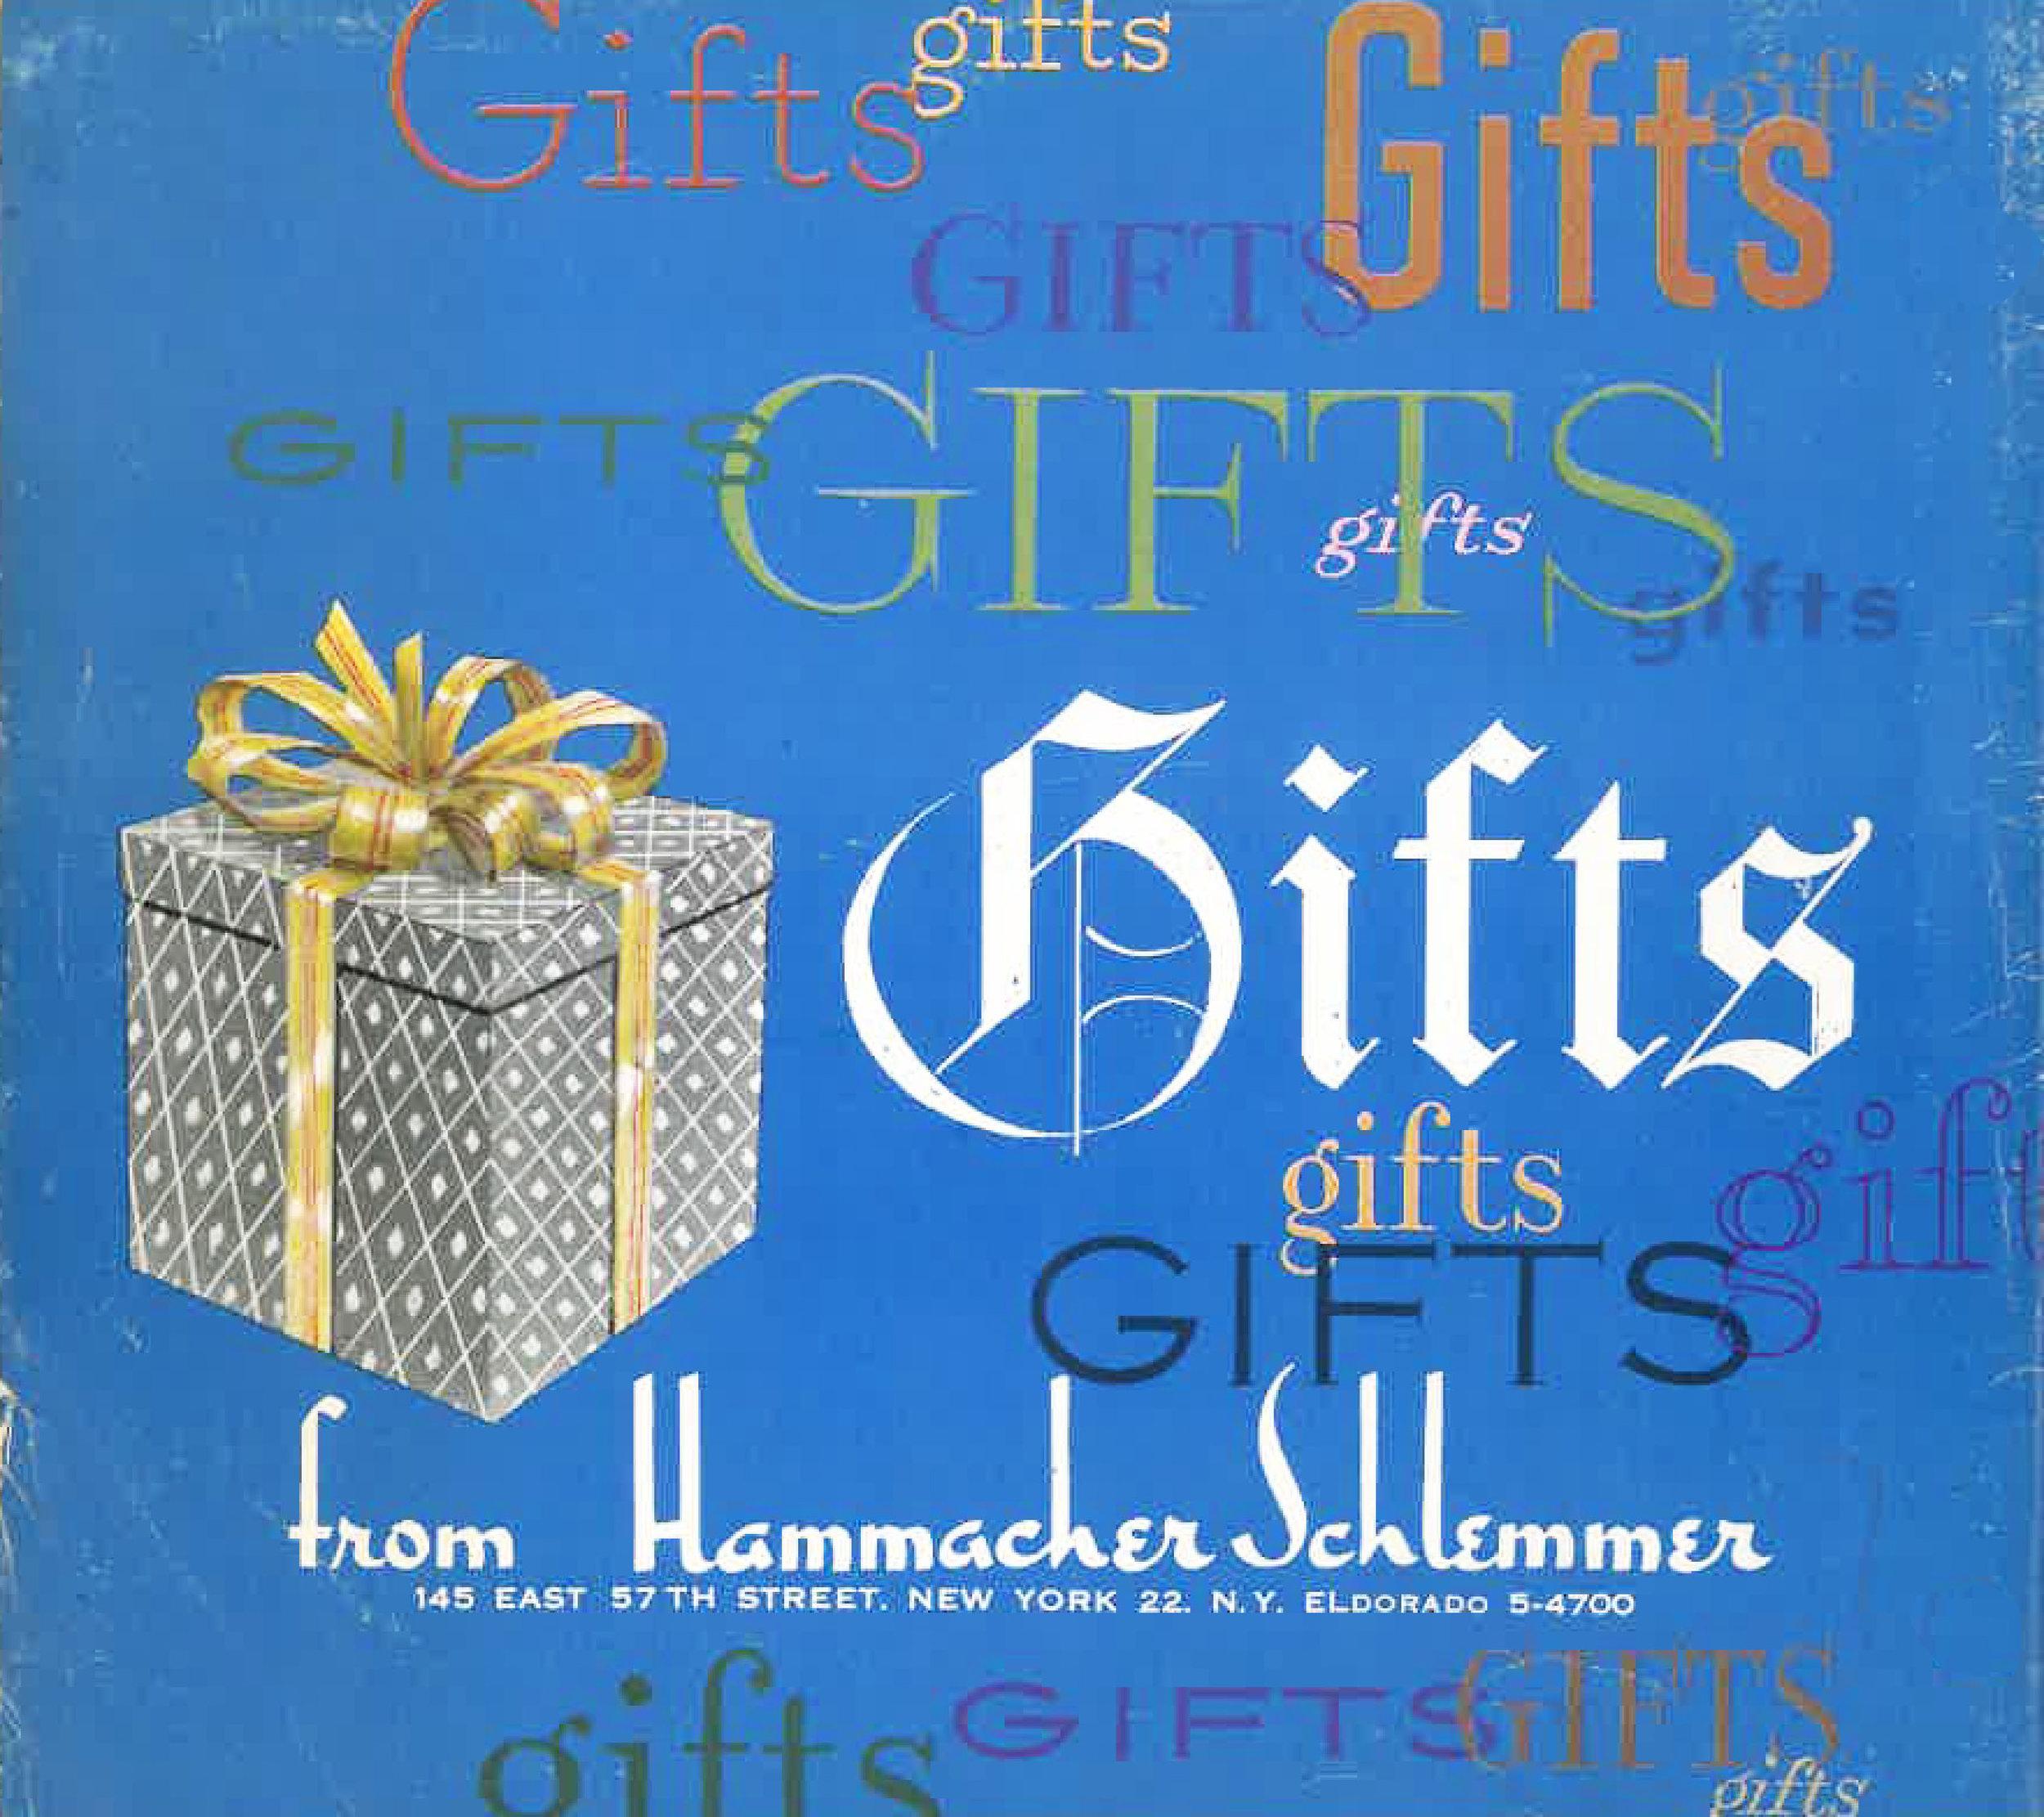 Cover of the 1954 Hammacher Schlemmer Gift Catalog